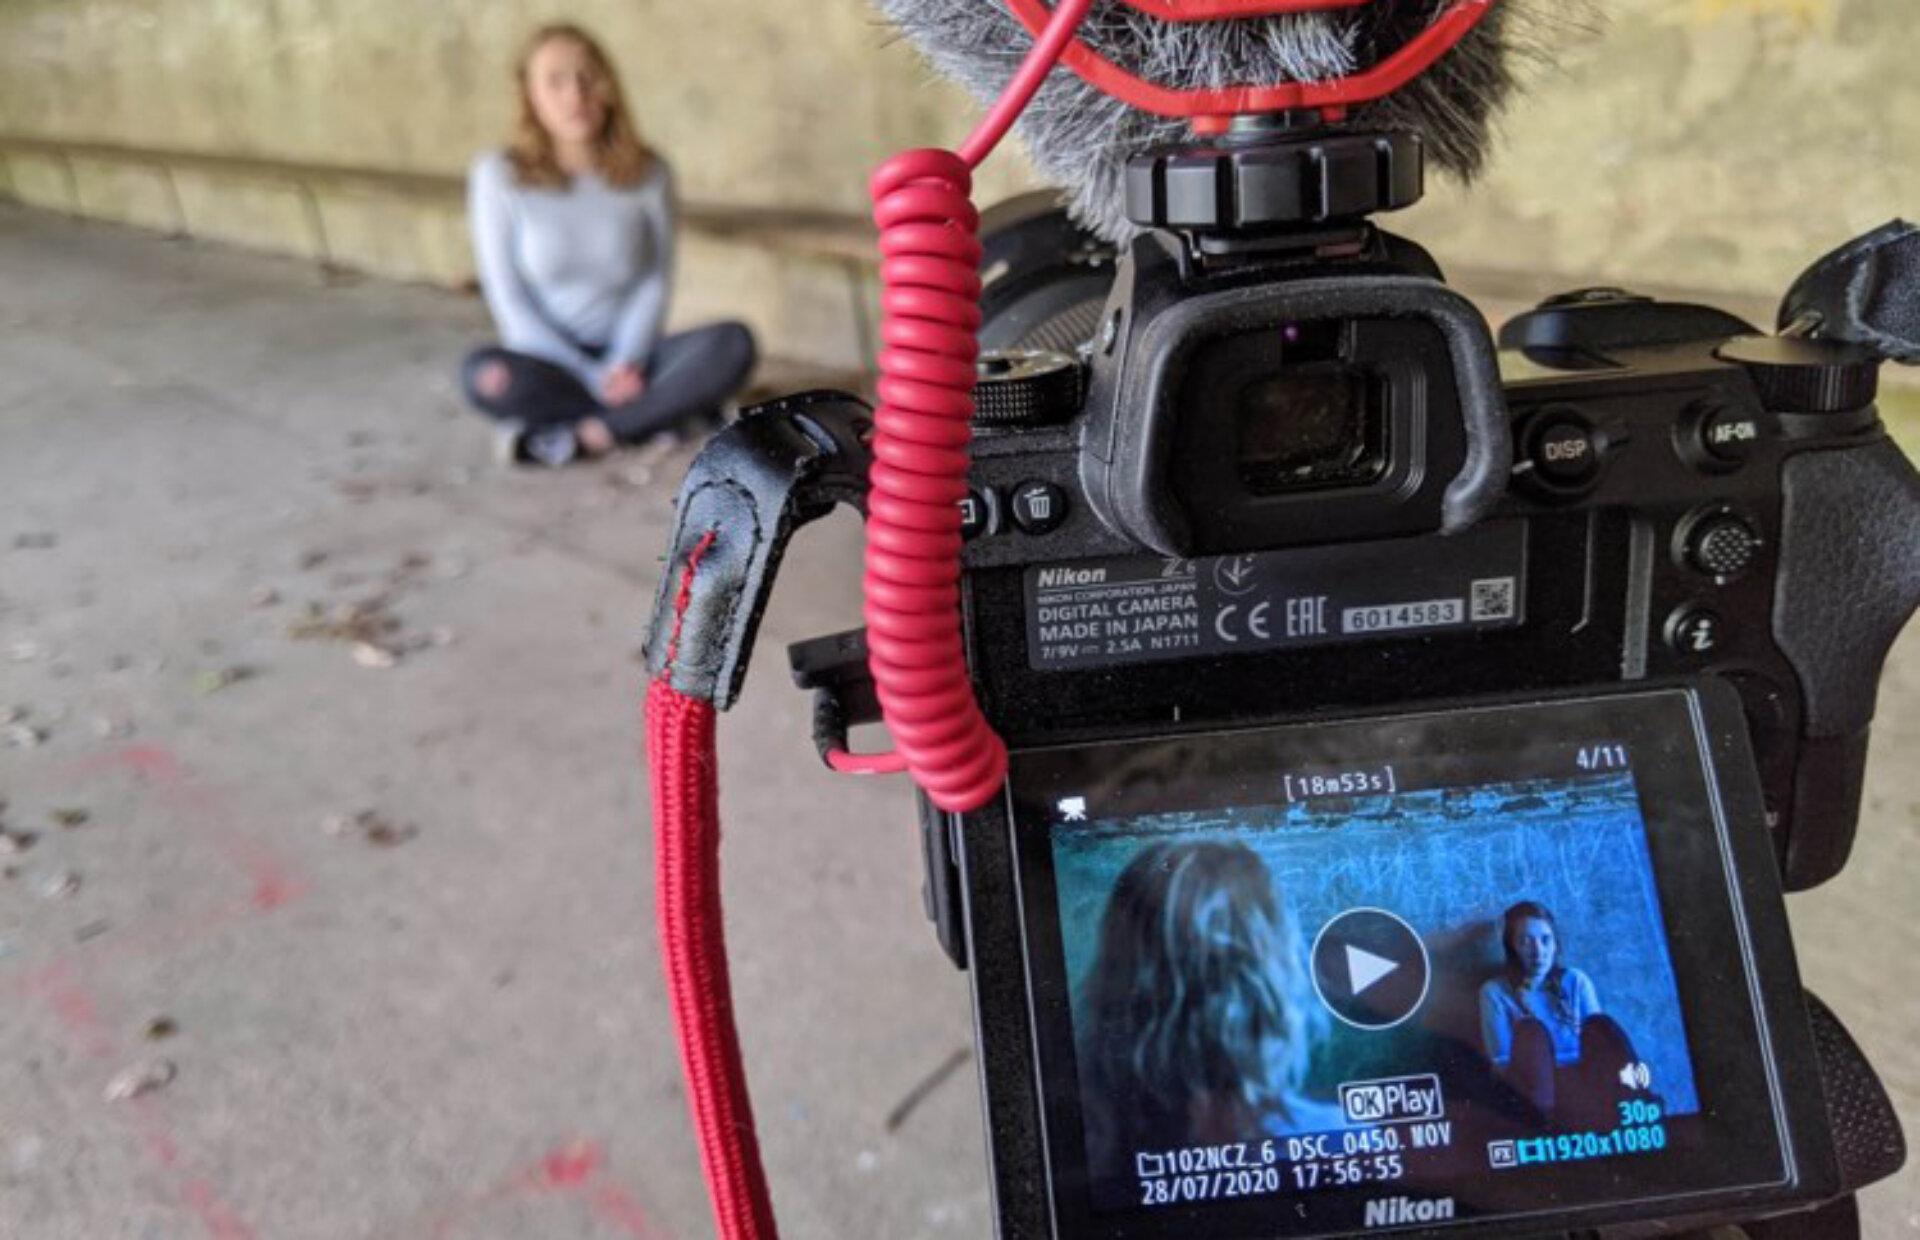 Moonlighters Filming Socially Distanced Festival